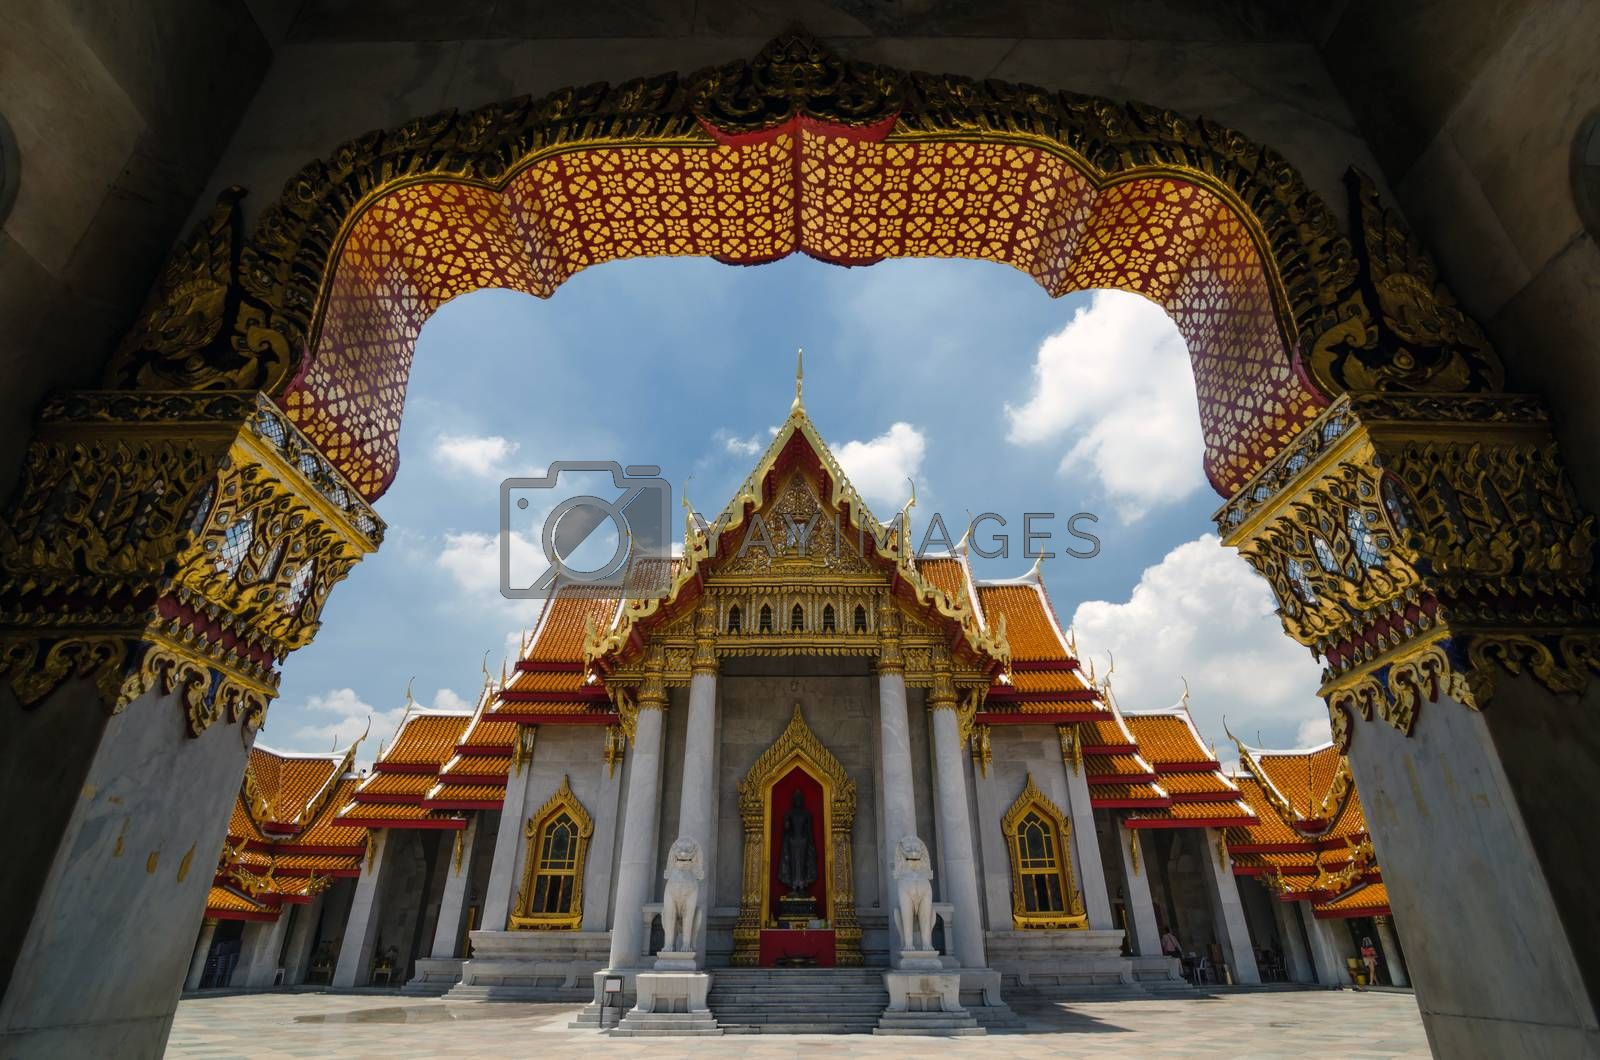 Wat Benjamabophit-The Marble Temple in Bangkok, Thailand  by siraanamwong